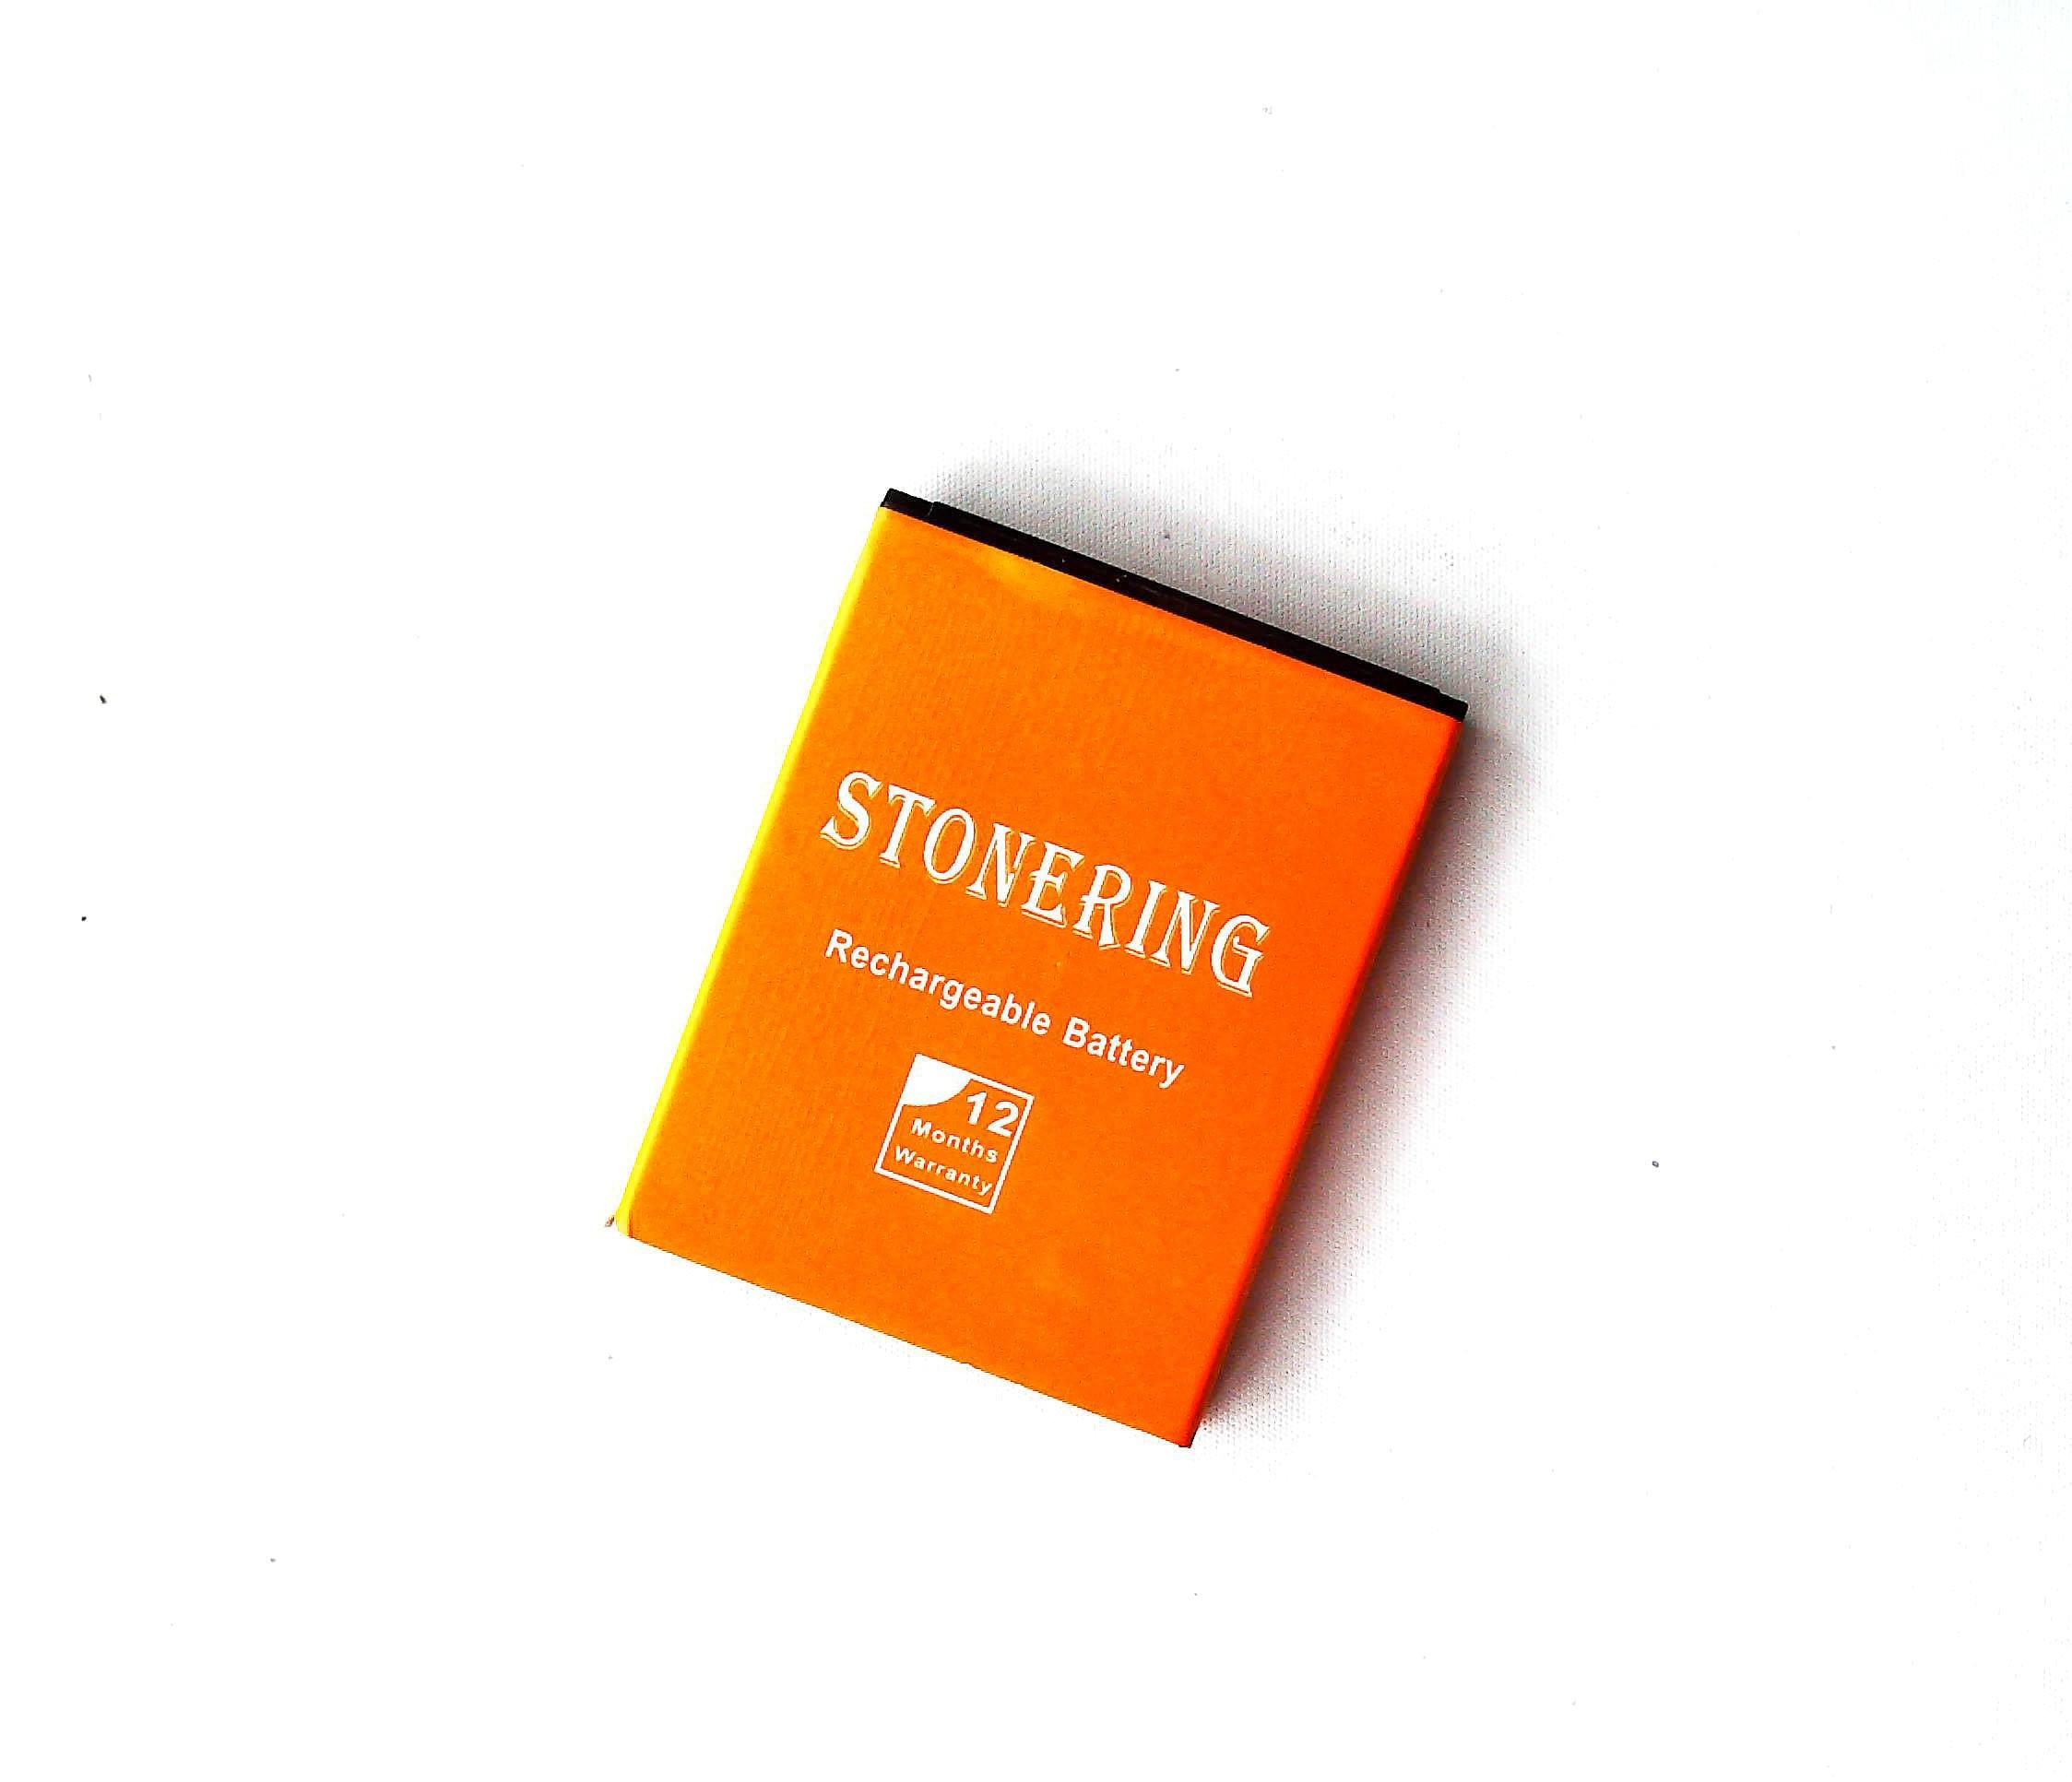 STONERING B150AE B150AC 1800 mAh Batterie Pour Samsung GALAXY i8260 i8262 GT de base g3508j G3502 G3508 G3509 G3502U B150AE